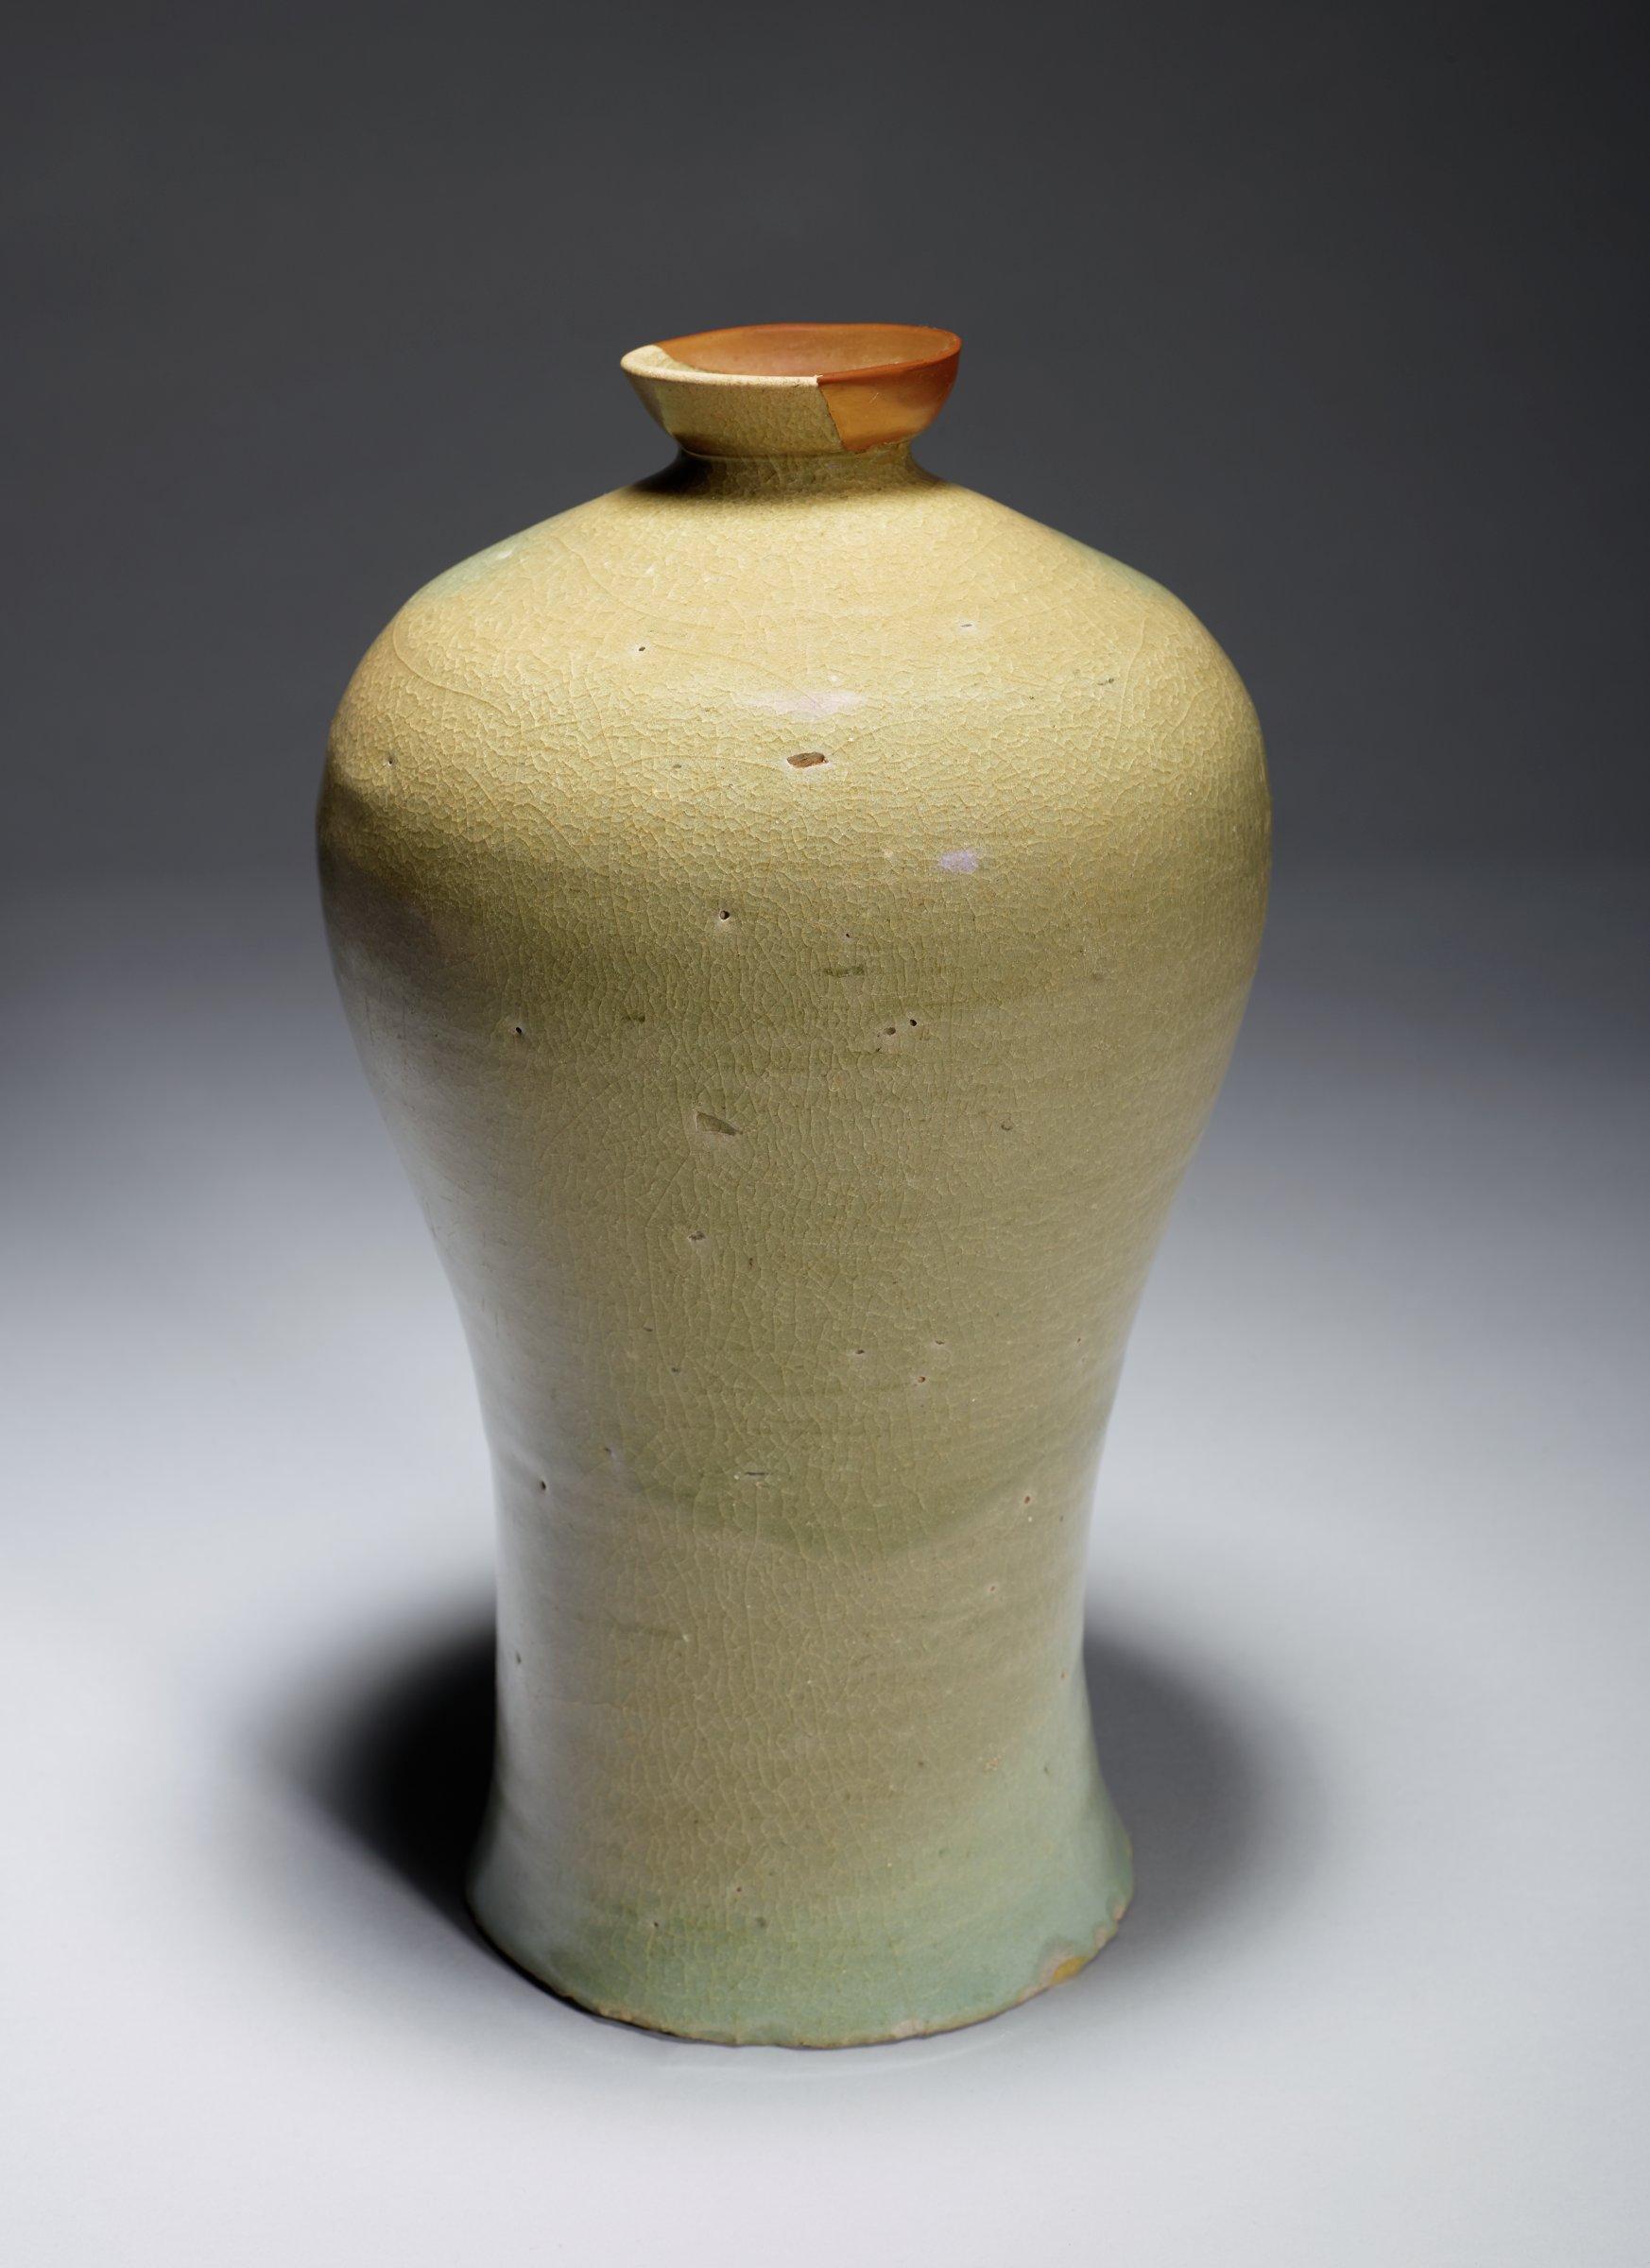 Celedon Glazed Plum Vase (Maebyong) with Gold Lacquer Lip, Korea, glazed porcelaneous stoneware, gold lacquer repair on lip. Some glaze on the underside. Darker celedon glaze over shoulder lighter glaze on lower half.